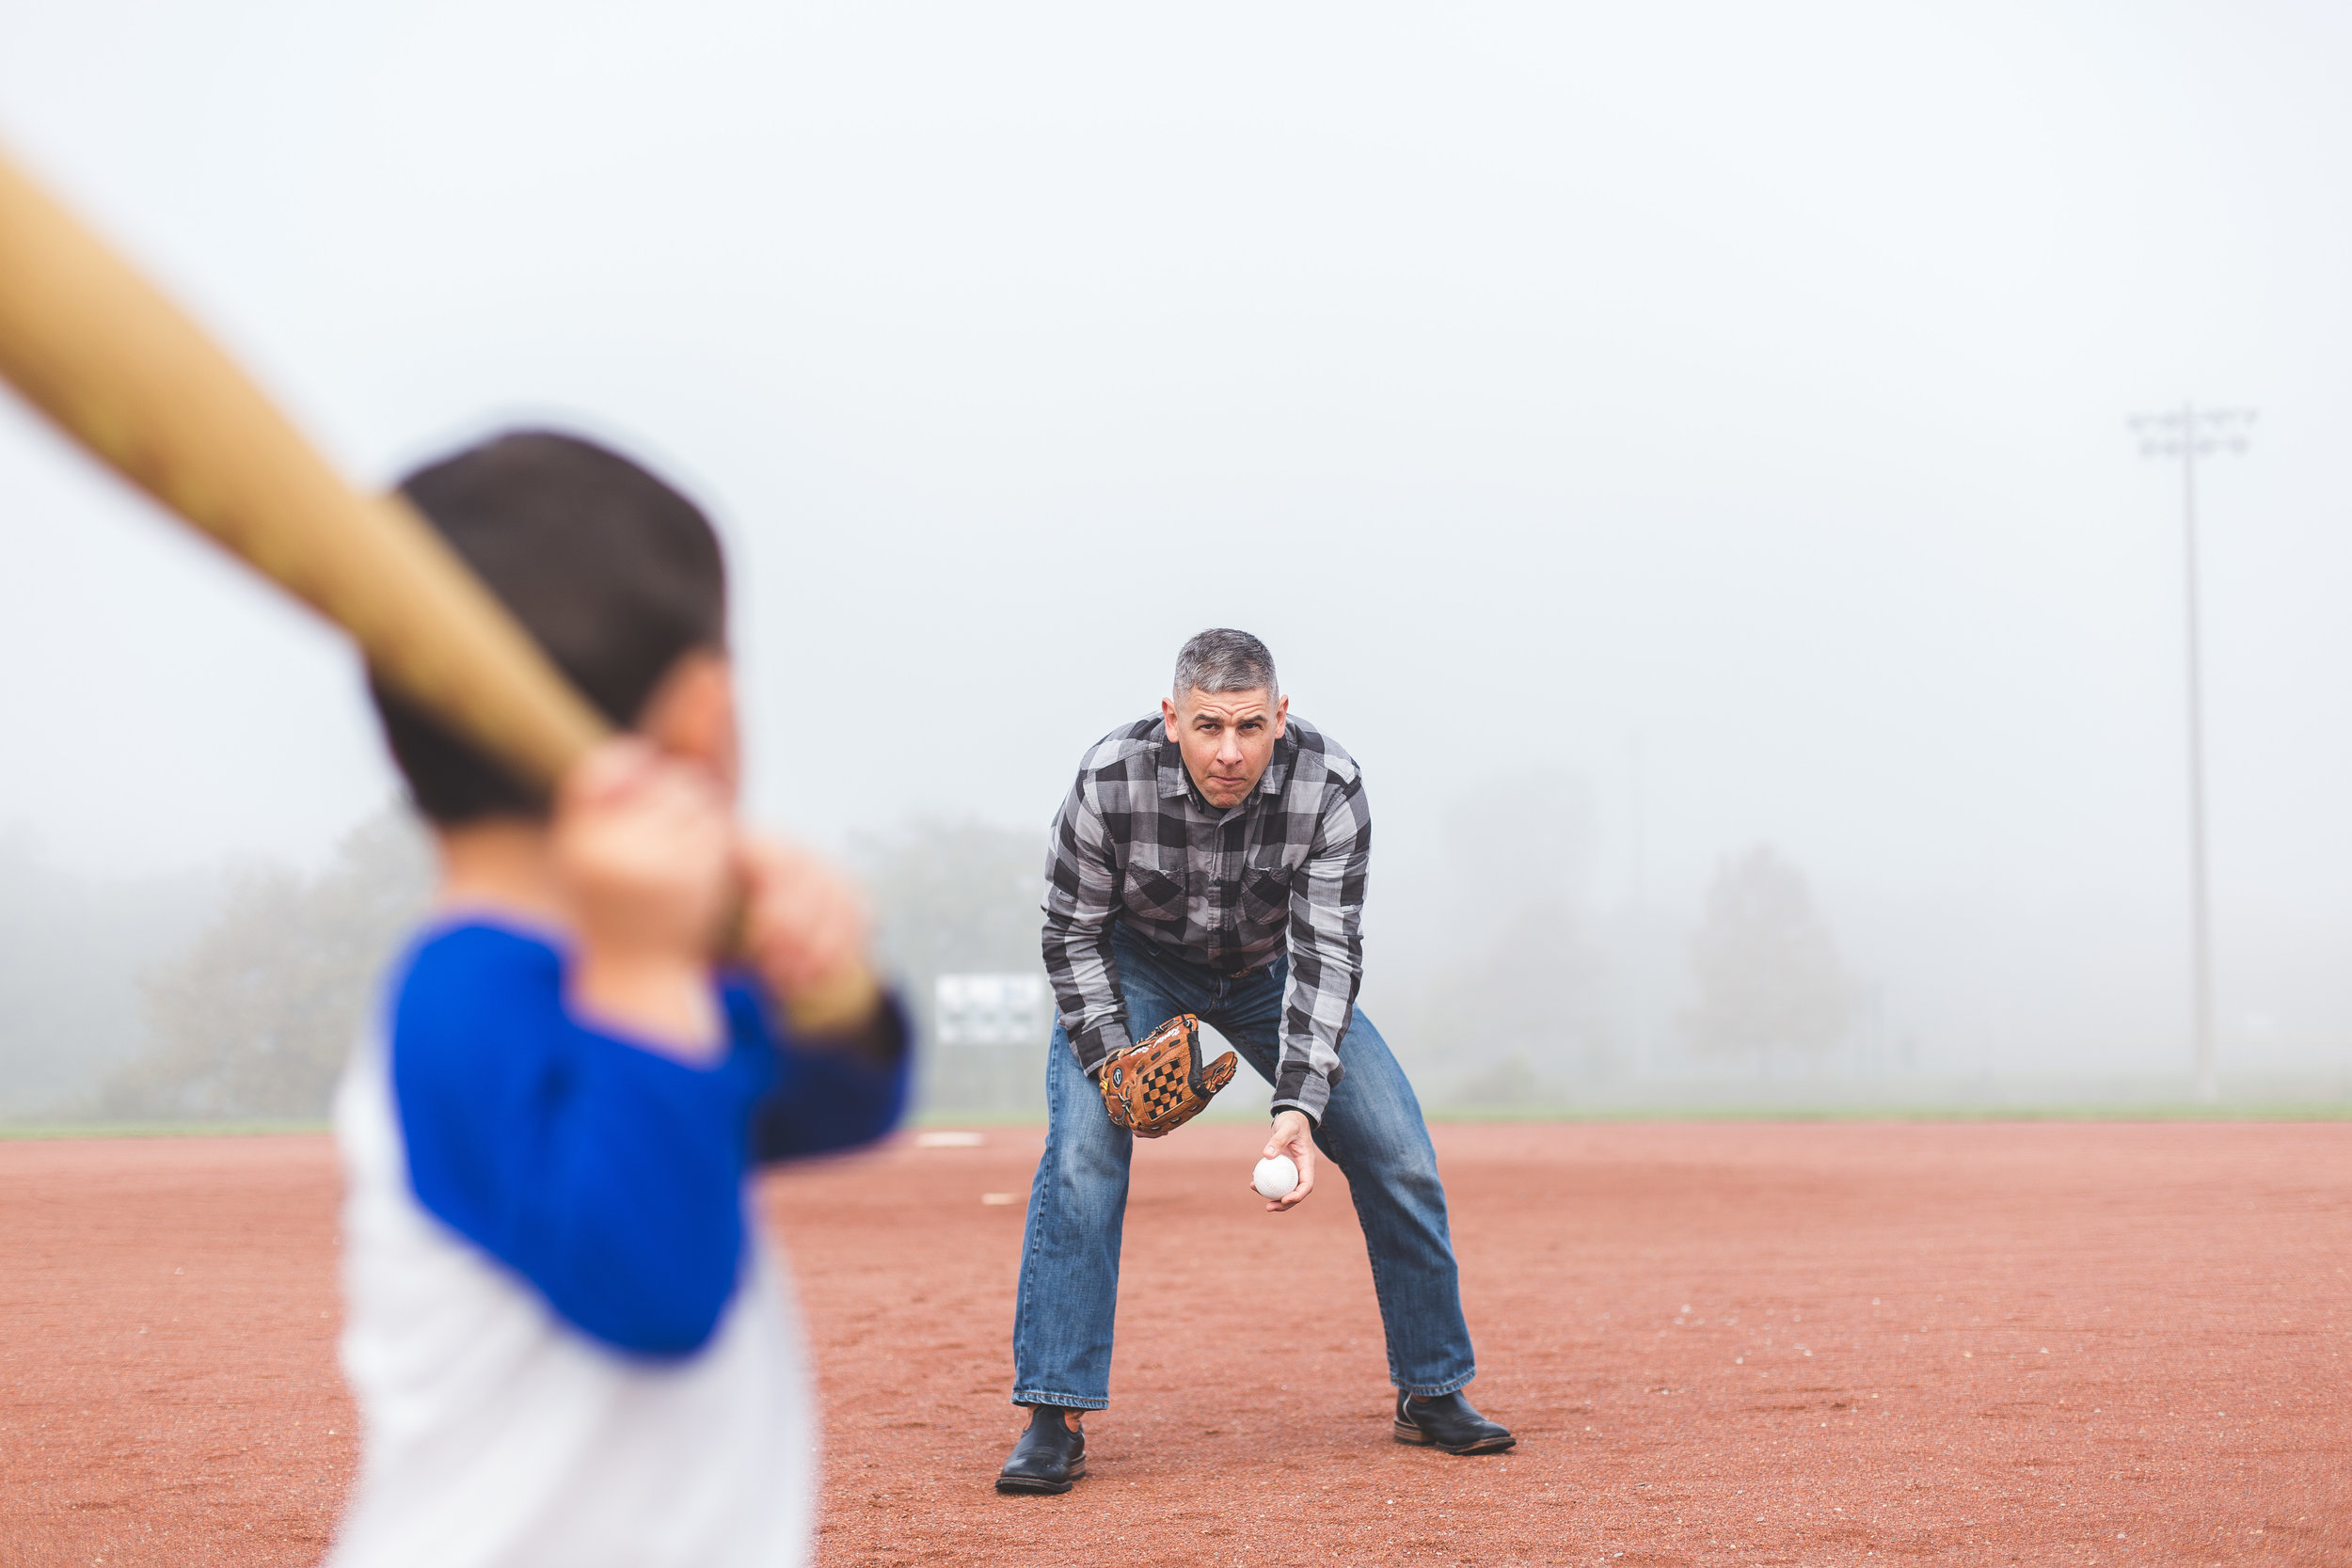 father son baseball lifestyle baseball diamond